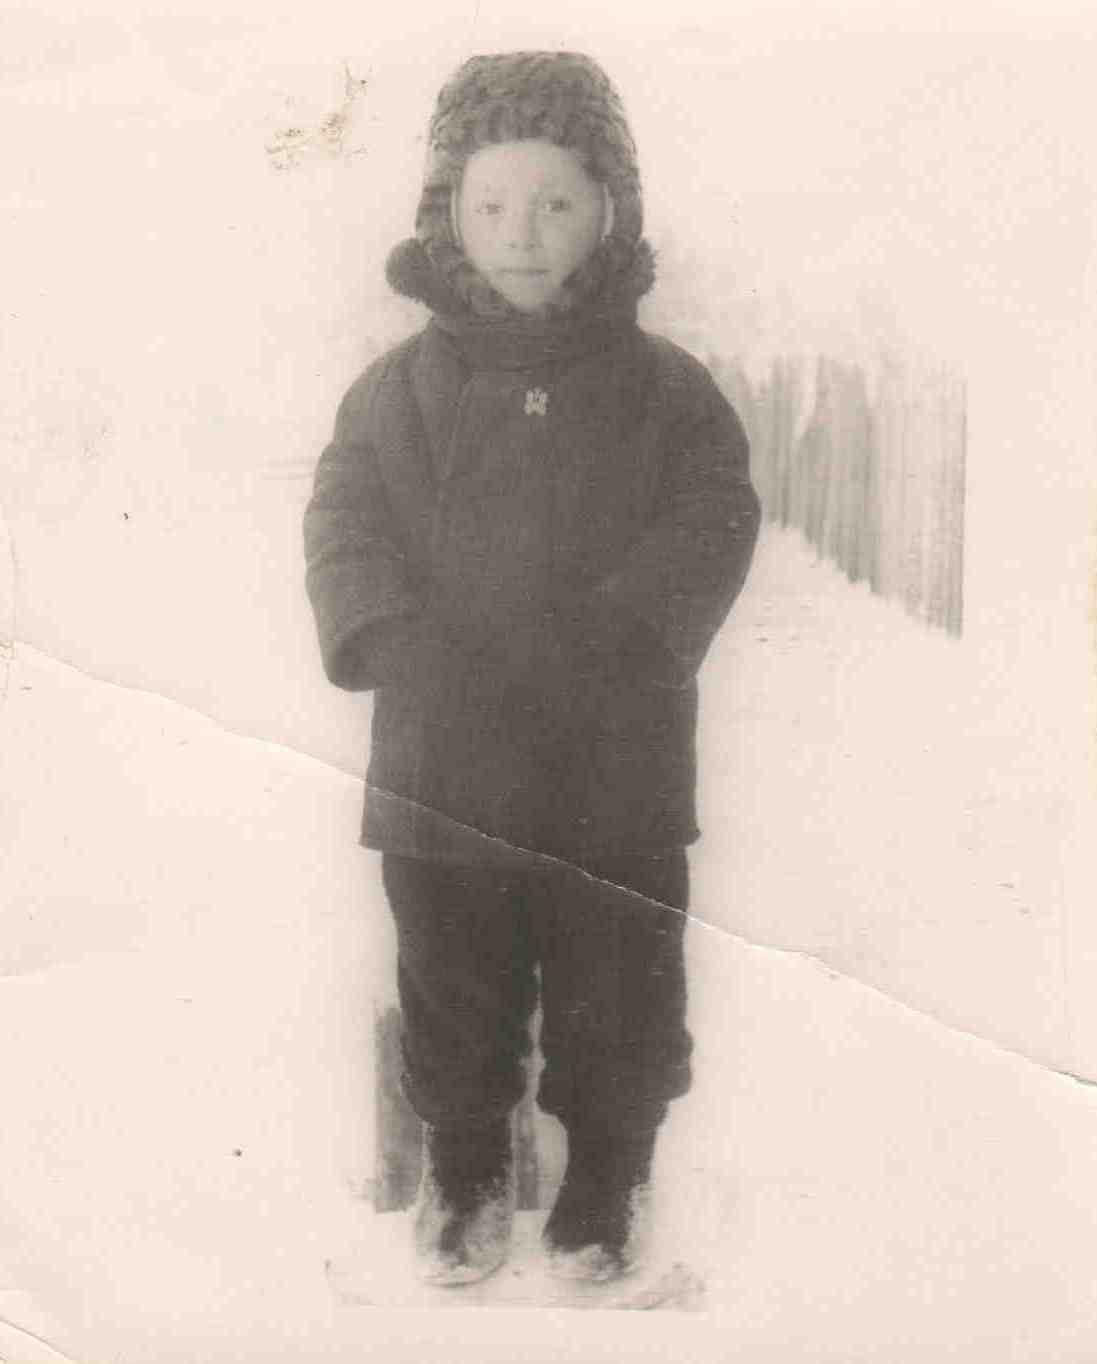 1970. п. Вандыш. Кравец Саша.